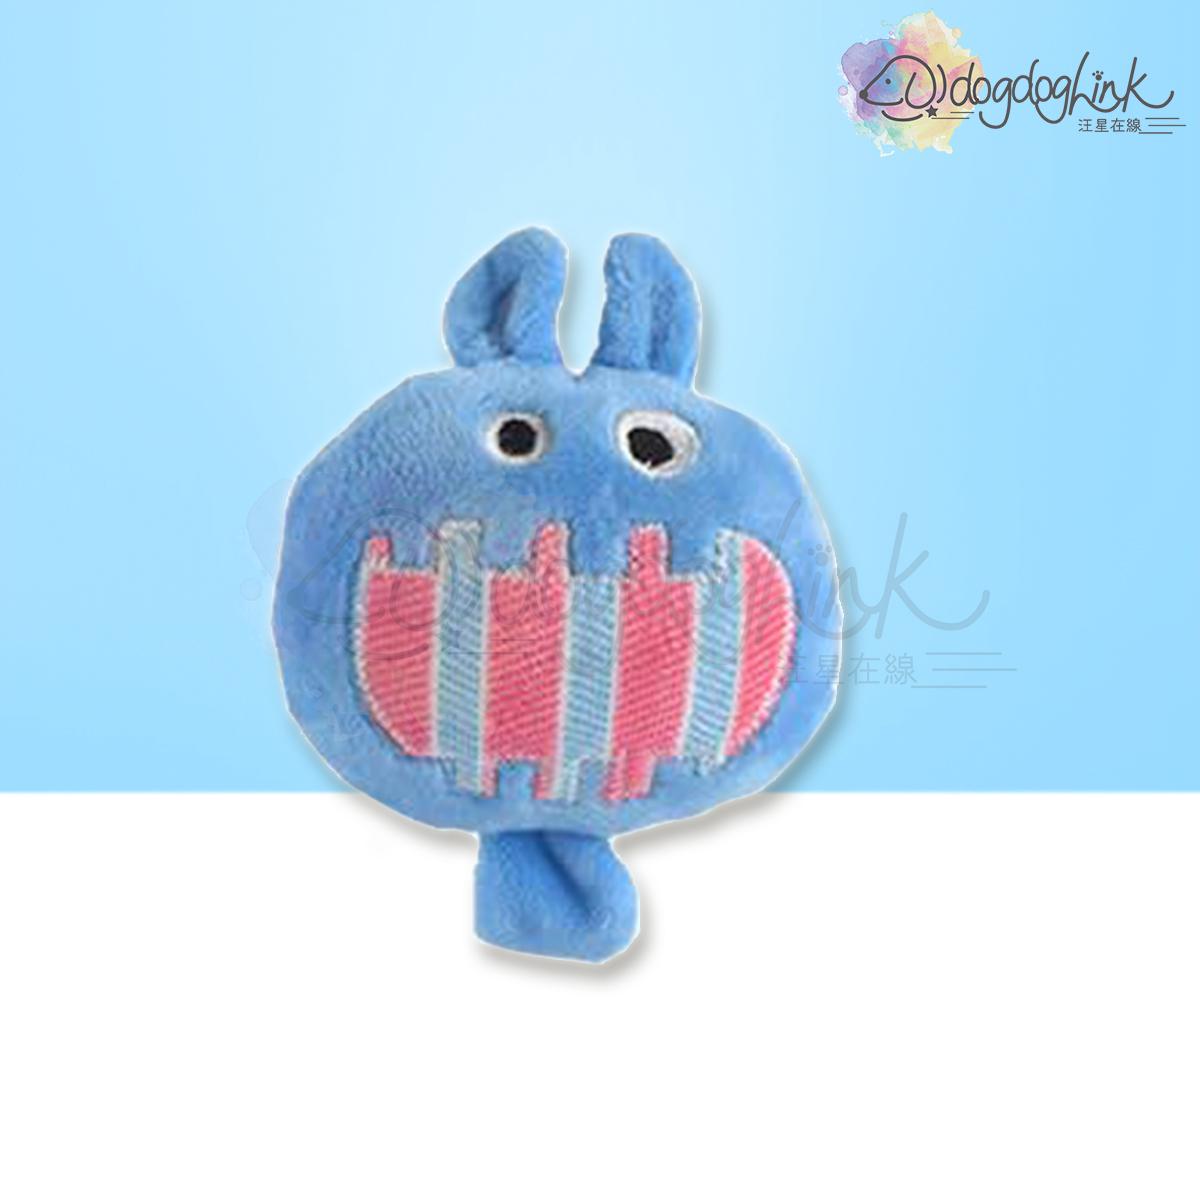 Big Mouth Series - Blue 13x10x3.5cm